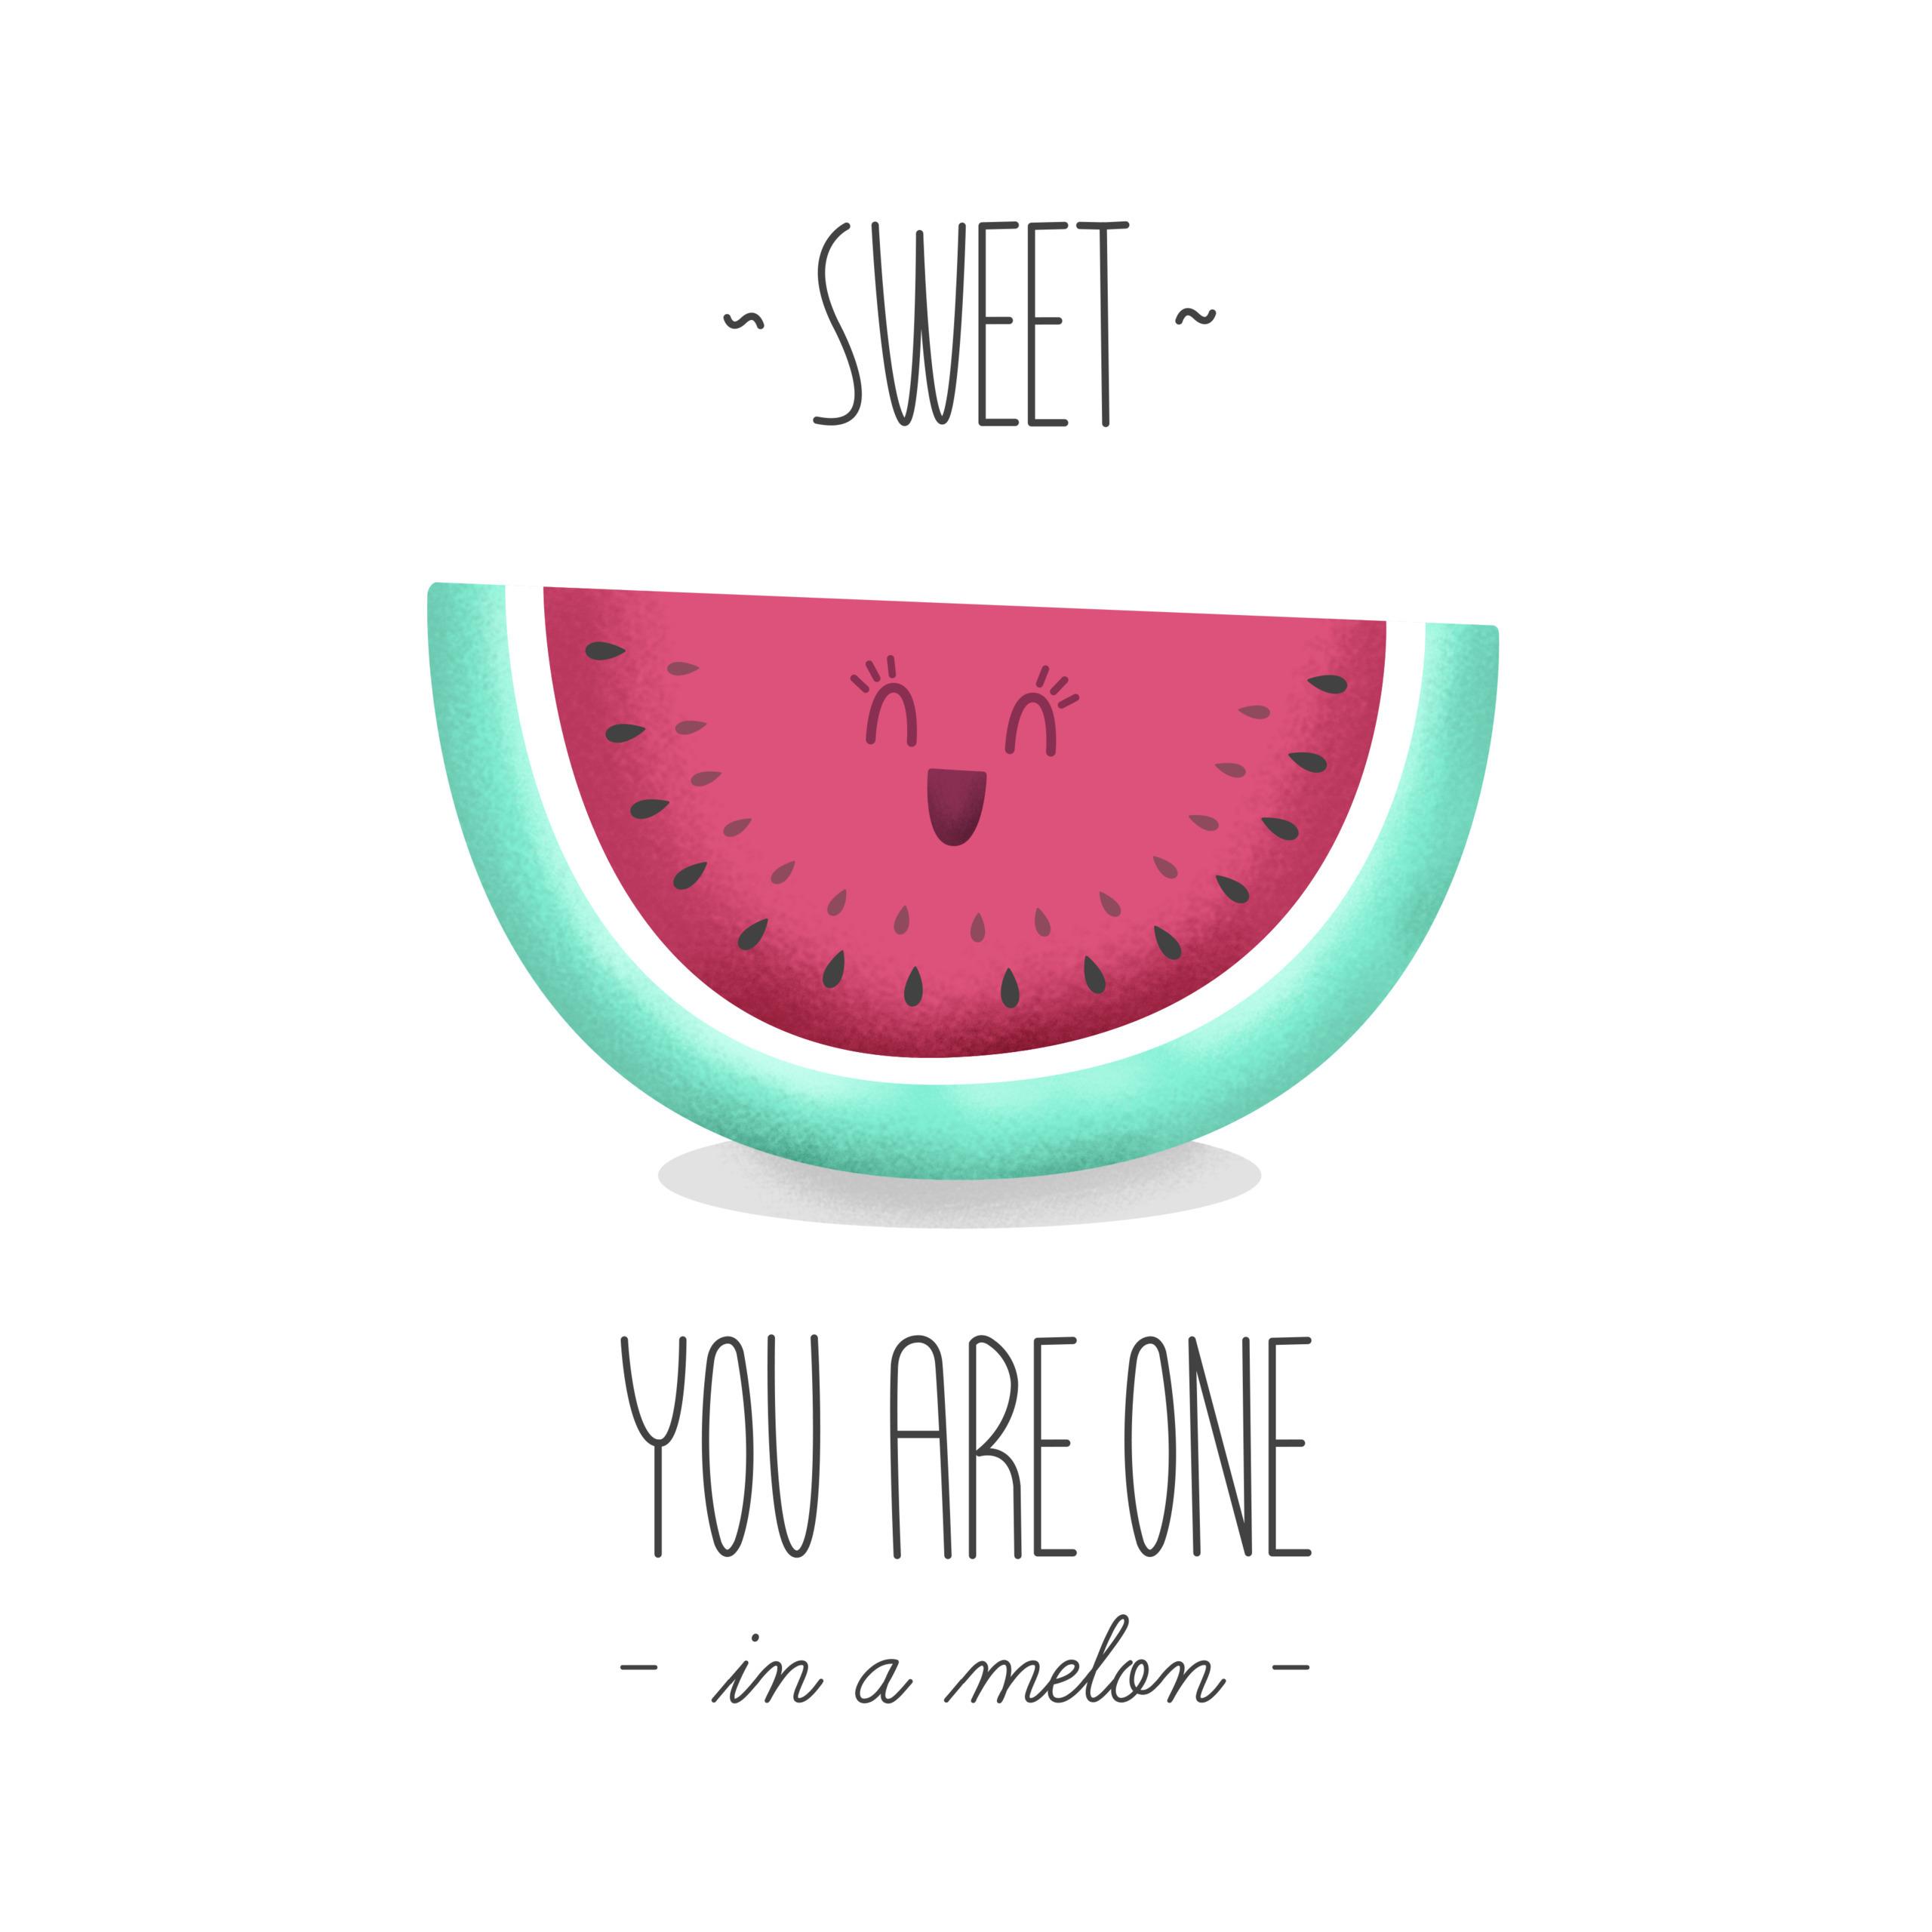 melon - illustration, design, typography - lucecitasroom | ello